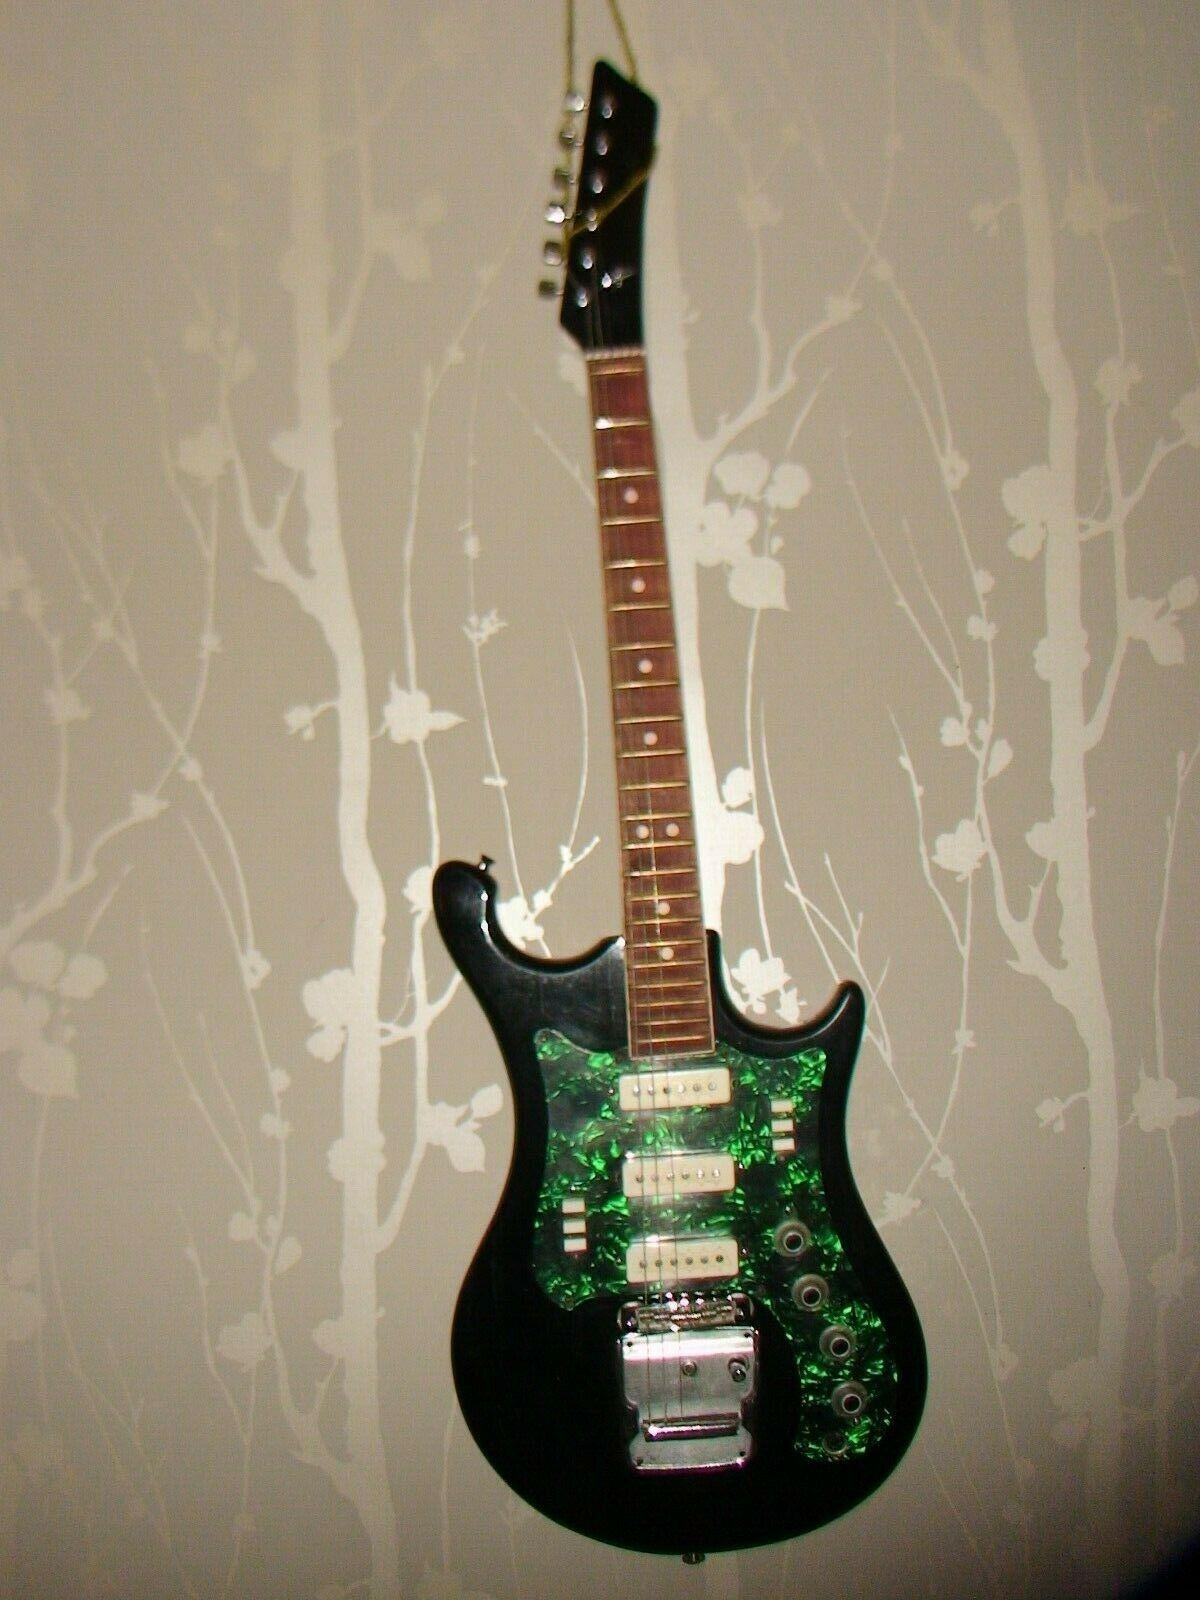 Ural 650 Electric Guitar Ussr Soviet Copy Yamaha Vintage Ebay In 2020 Electric Guitar Guitar Vintage